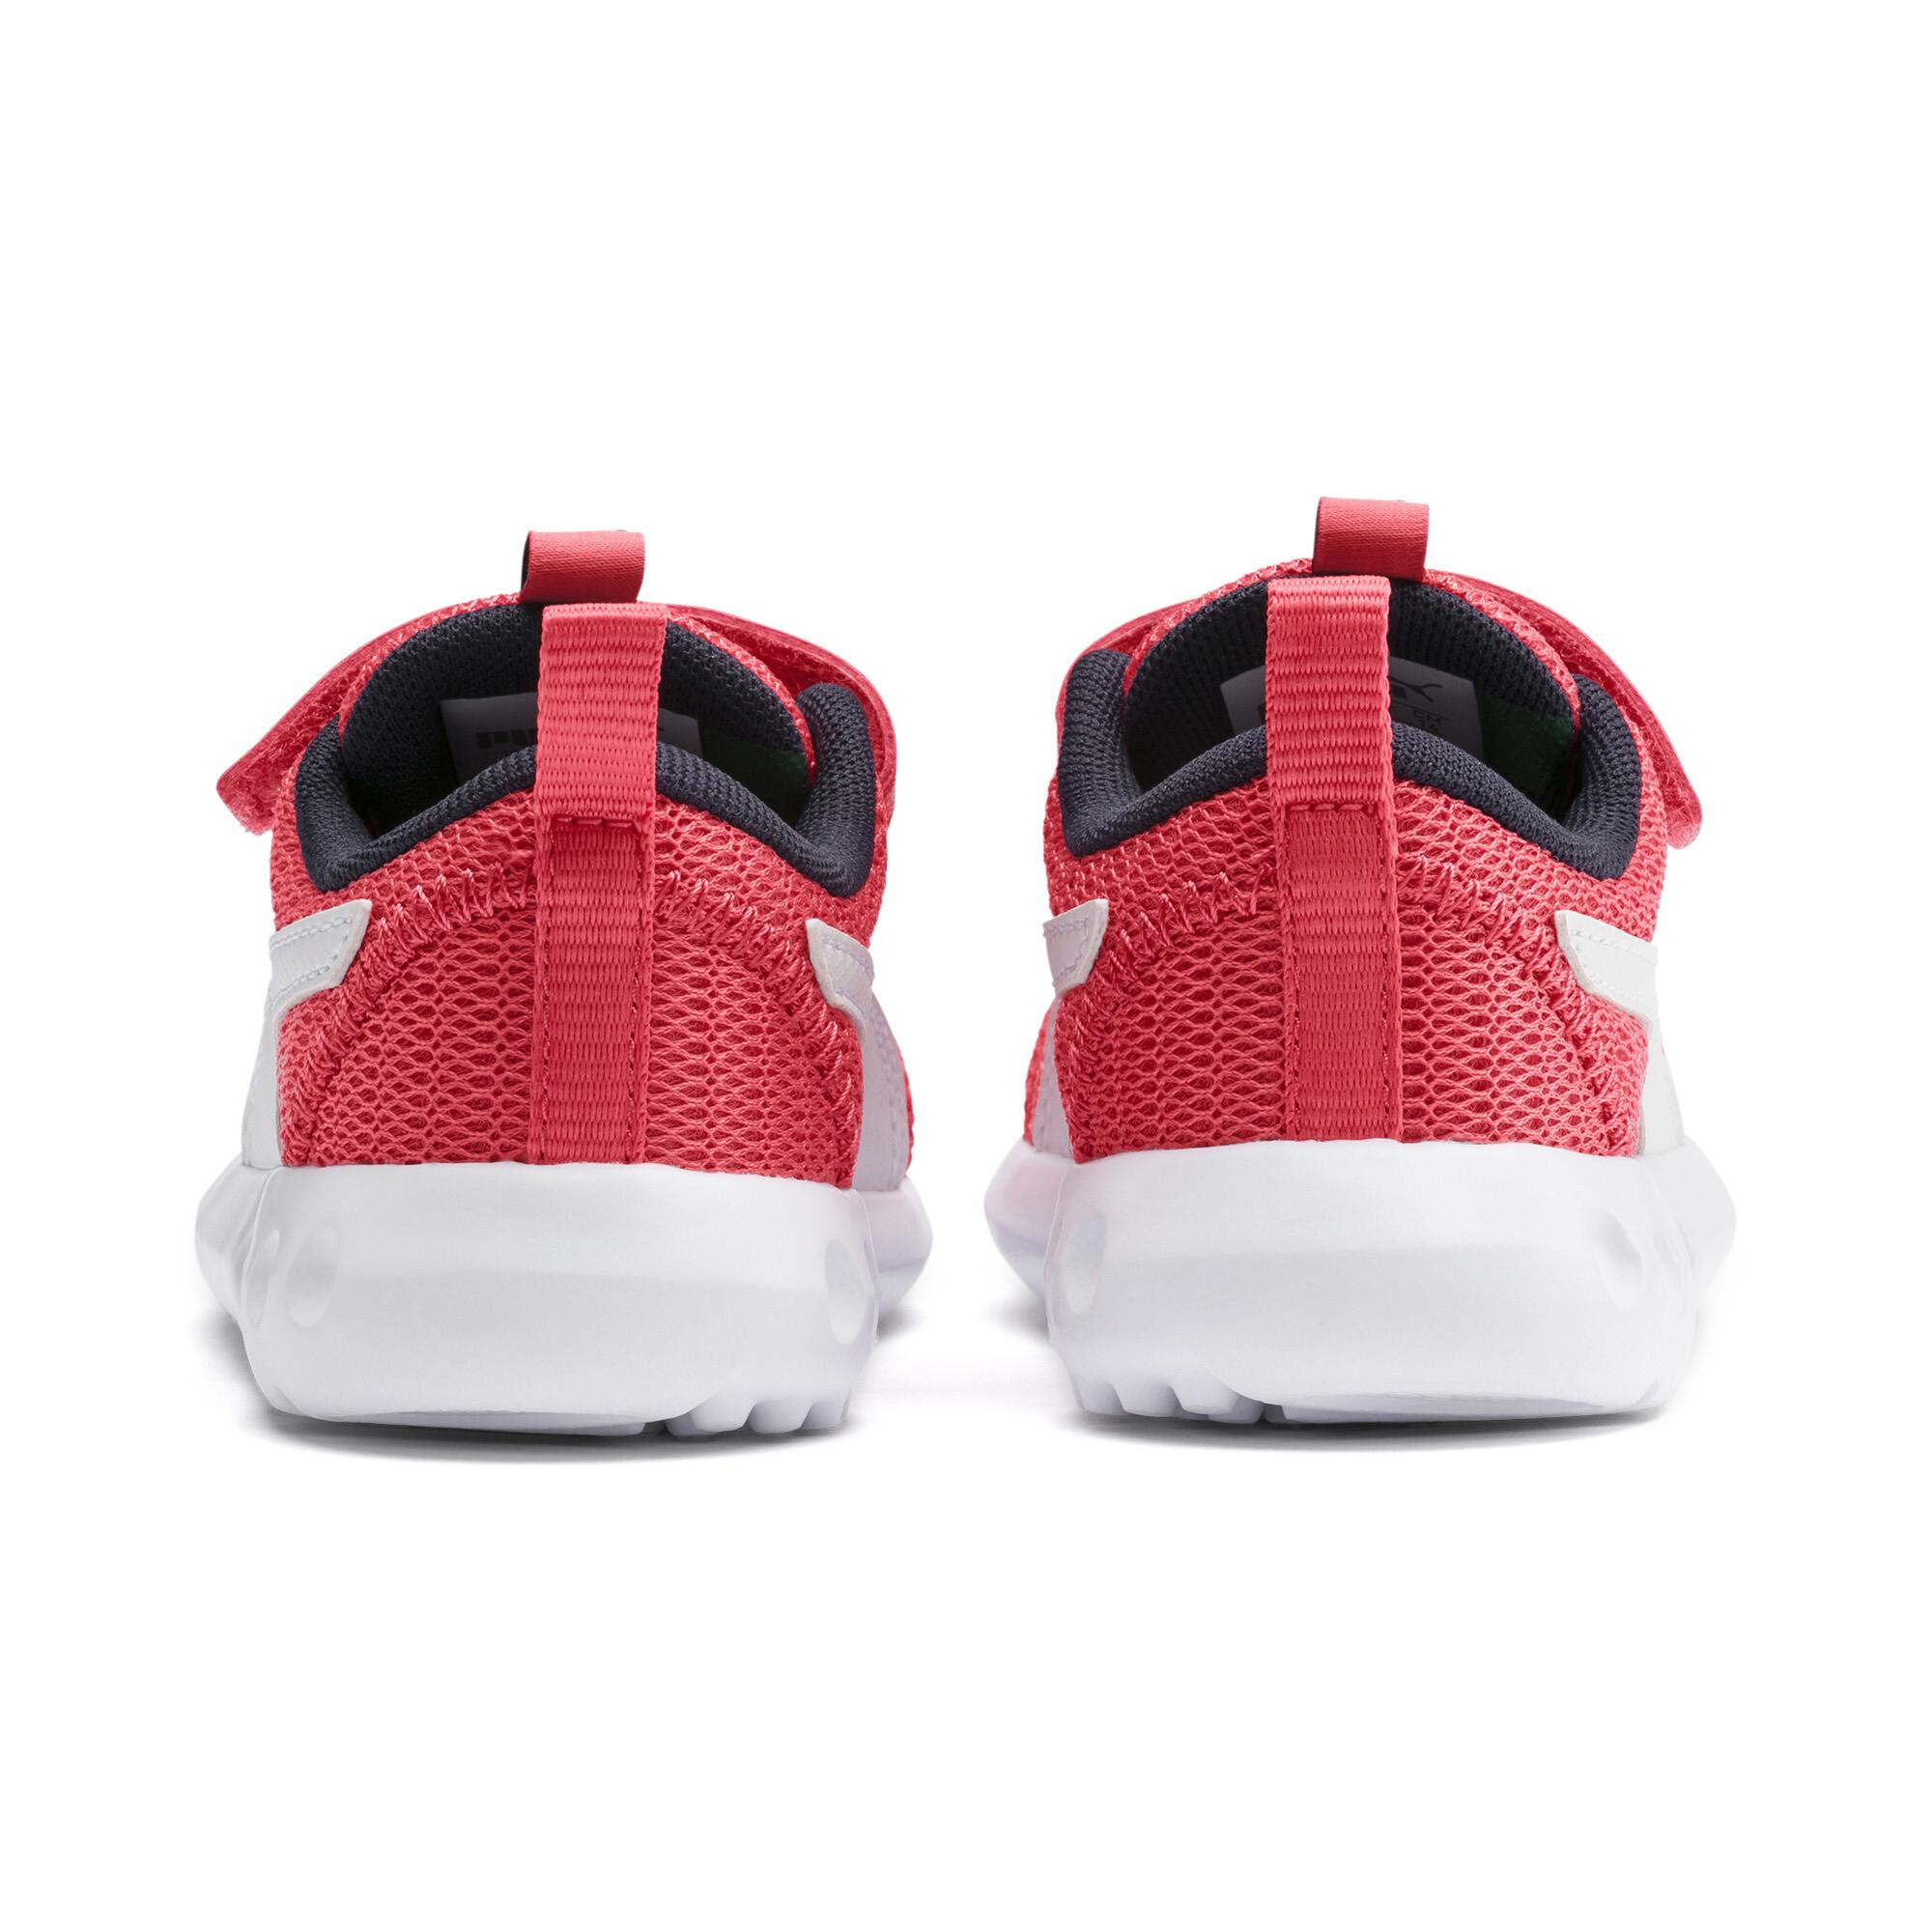 PUMA-Carson-2-Toddler-Shoes-Unisex-Shoe-Kids thumbnail 12